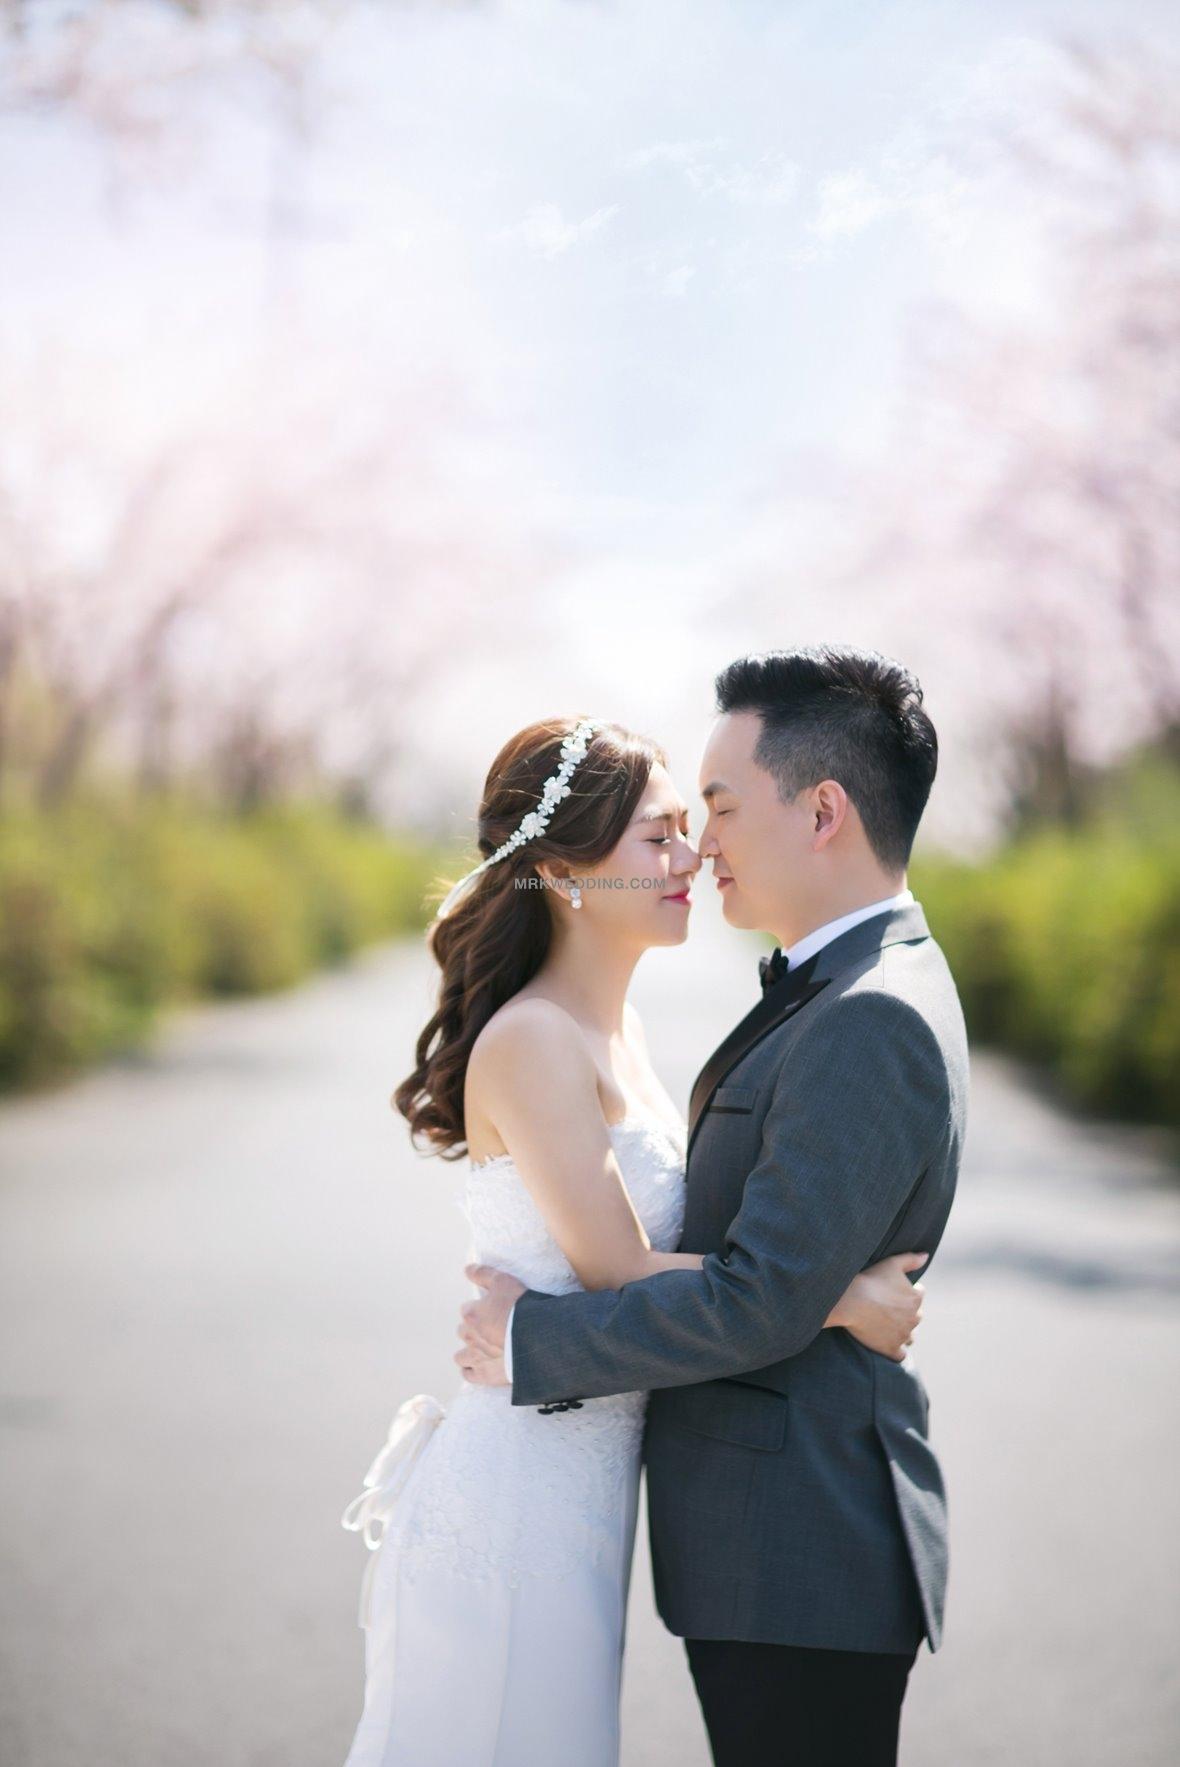 Jeju pre wedding (6).jpg